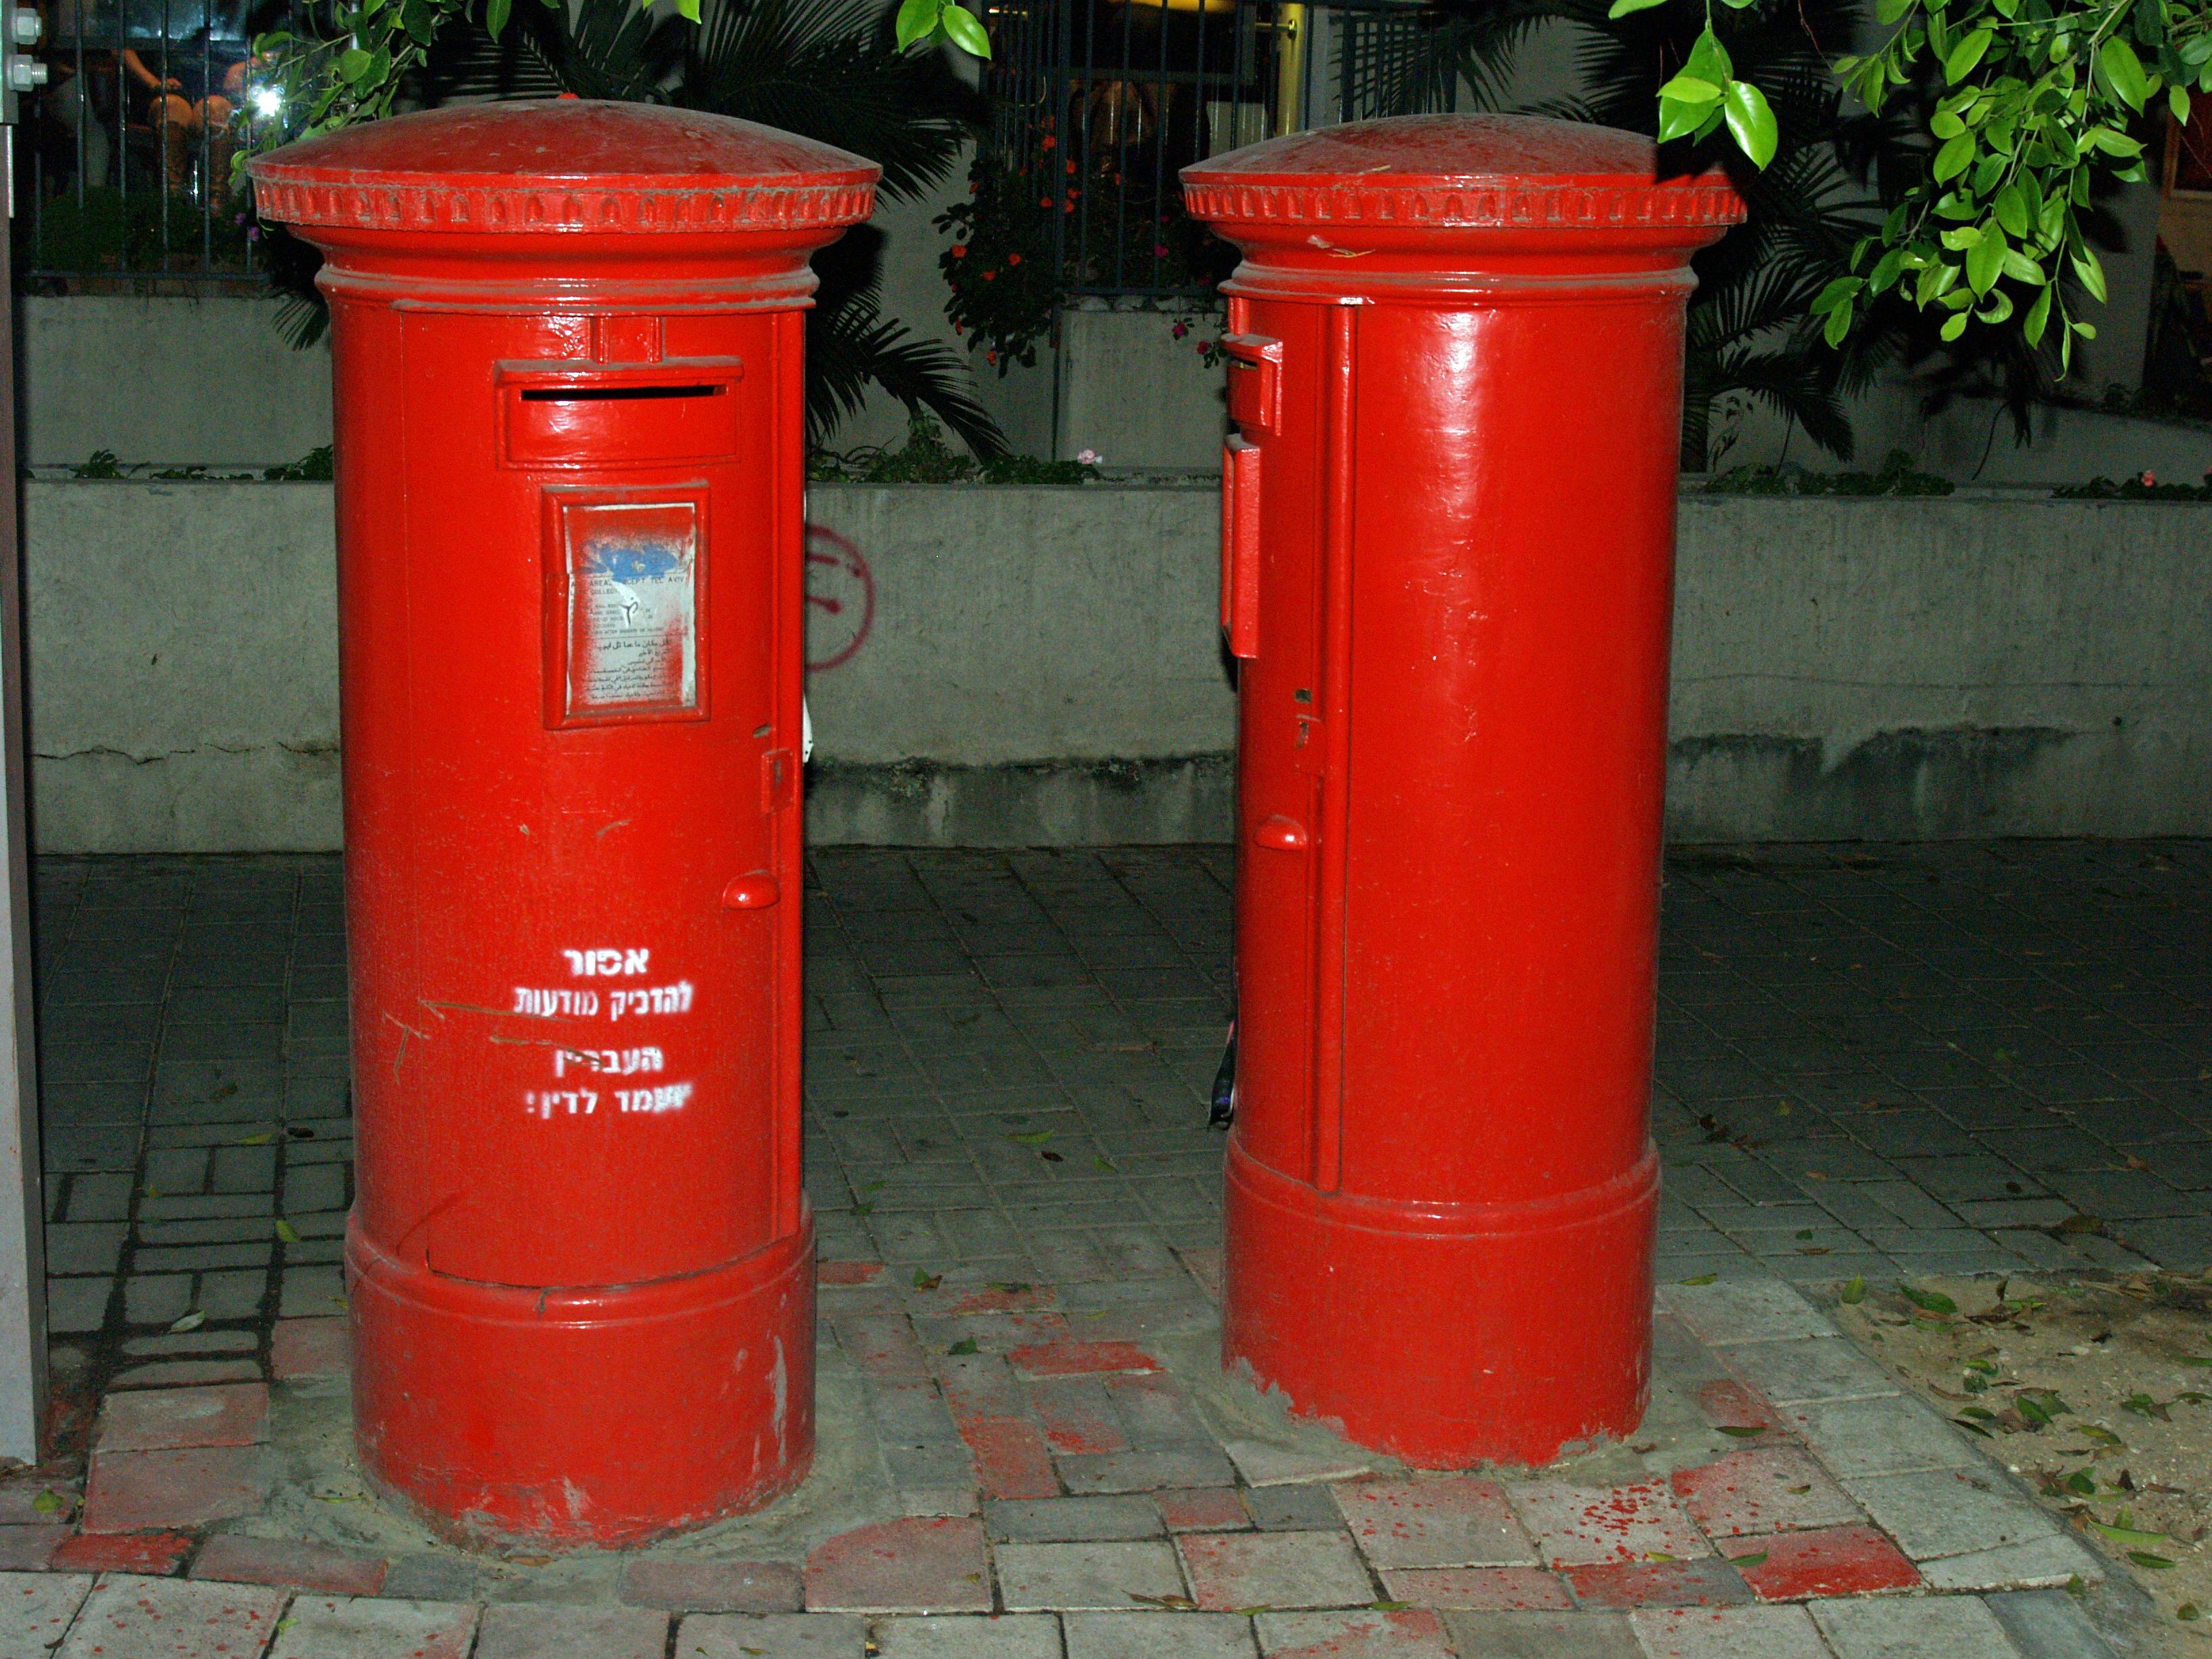 File:Tel Aviv British mailboxes by David Shankbone.jpg - Wikimedia ...